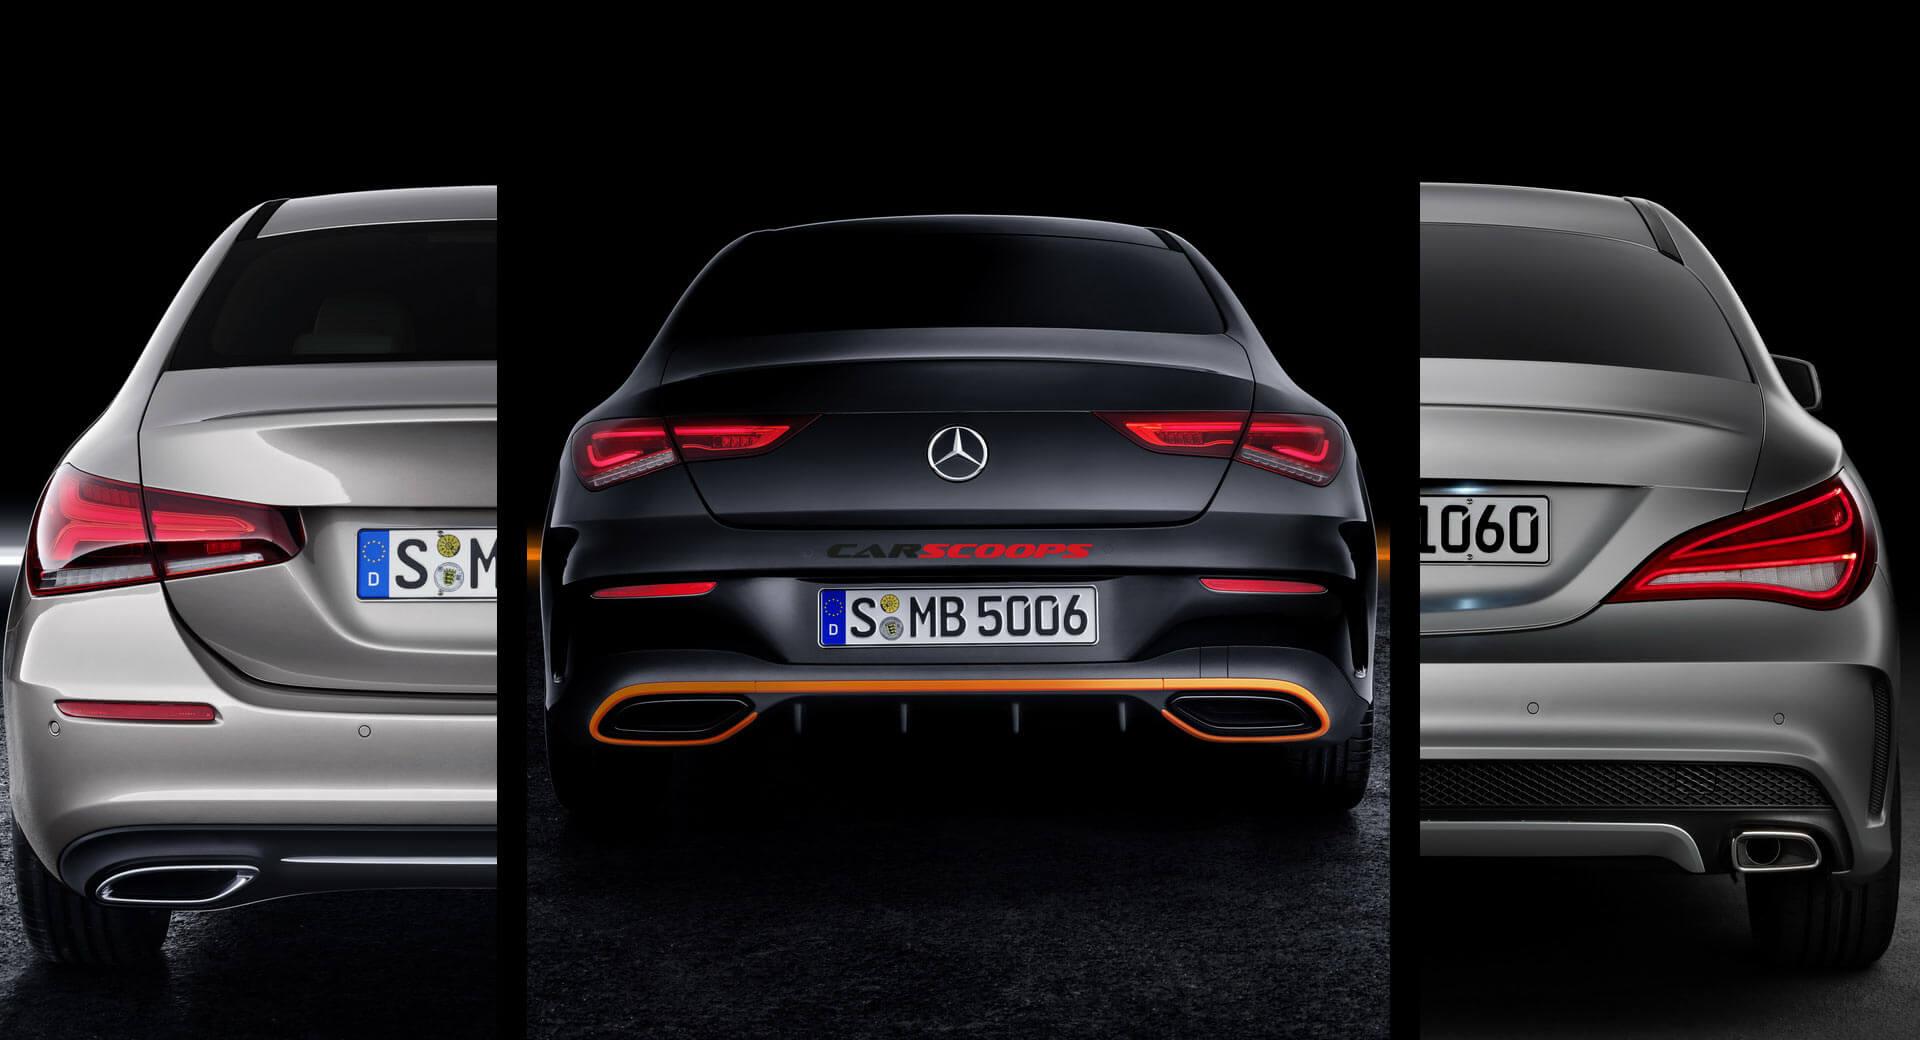 new mercedes cla vs old cla vs new aclass sedan are they